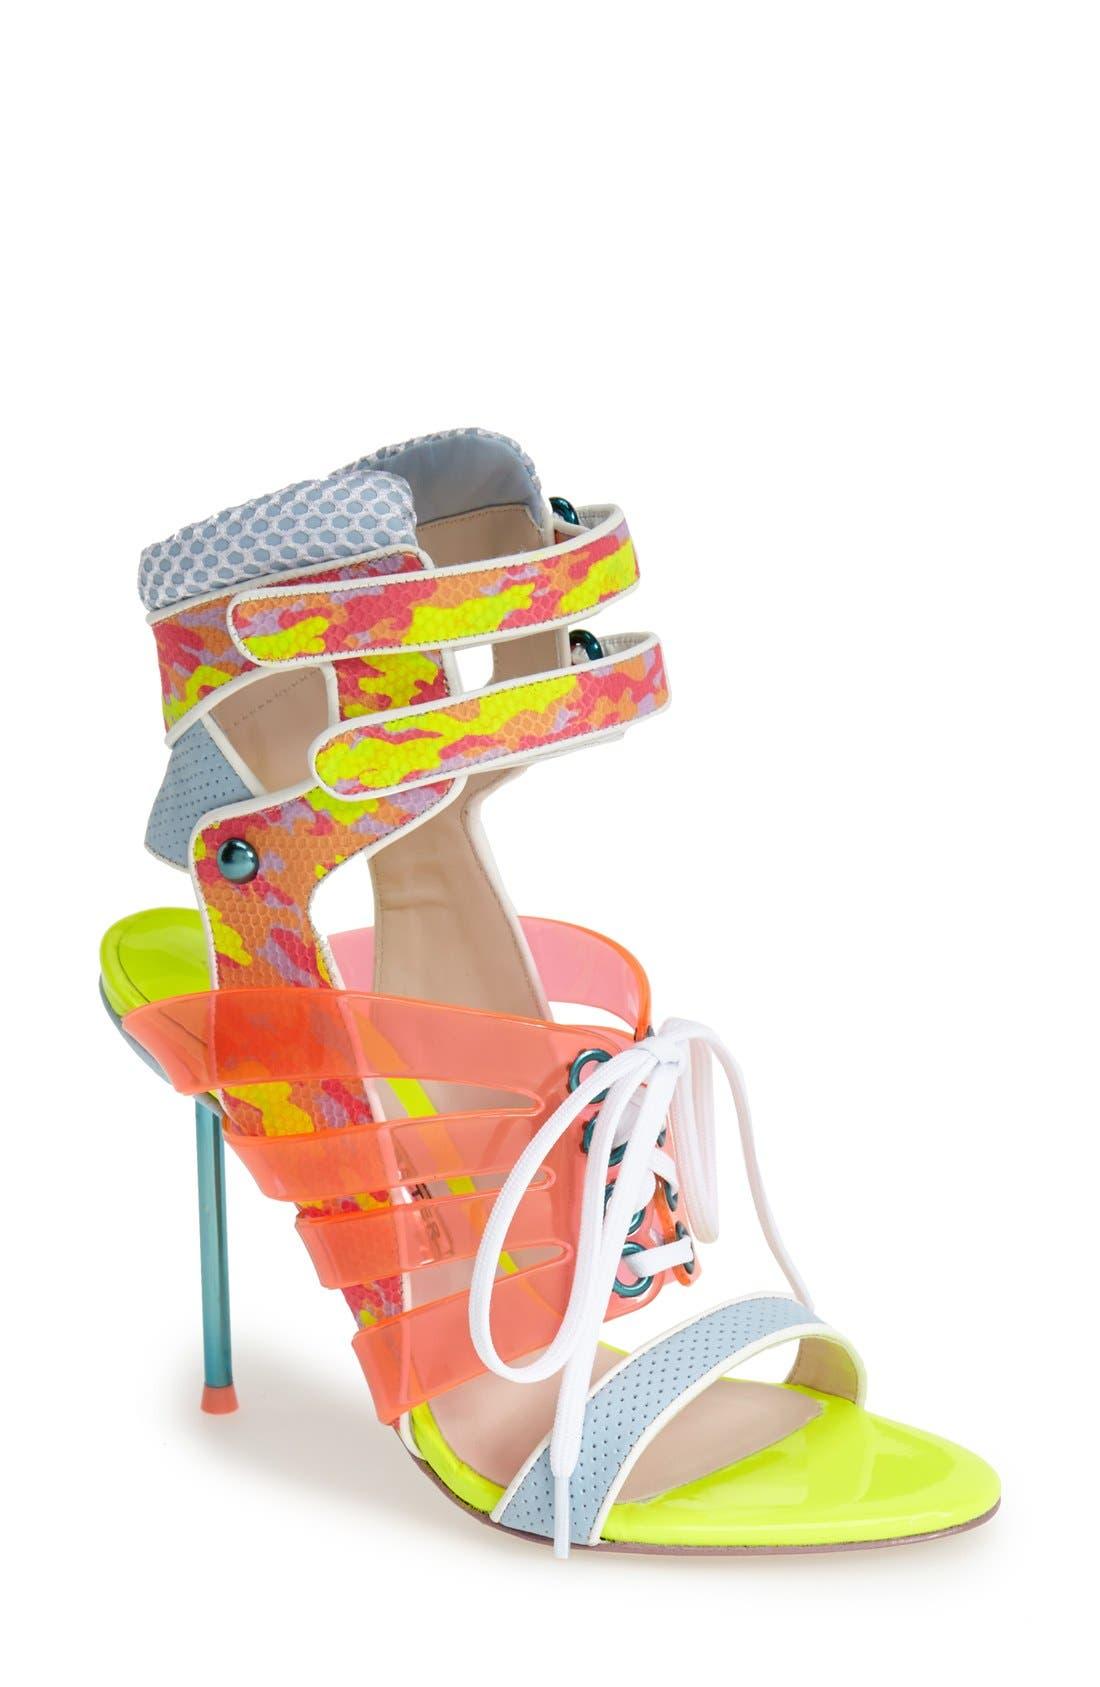 Alternate Image 1 Selected - Sophia Webster 'Jourdan' Mixed Media Bootie (Women)